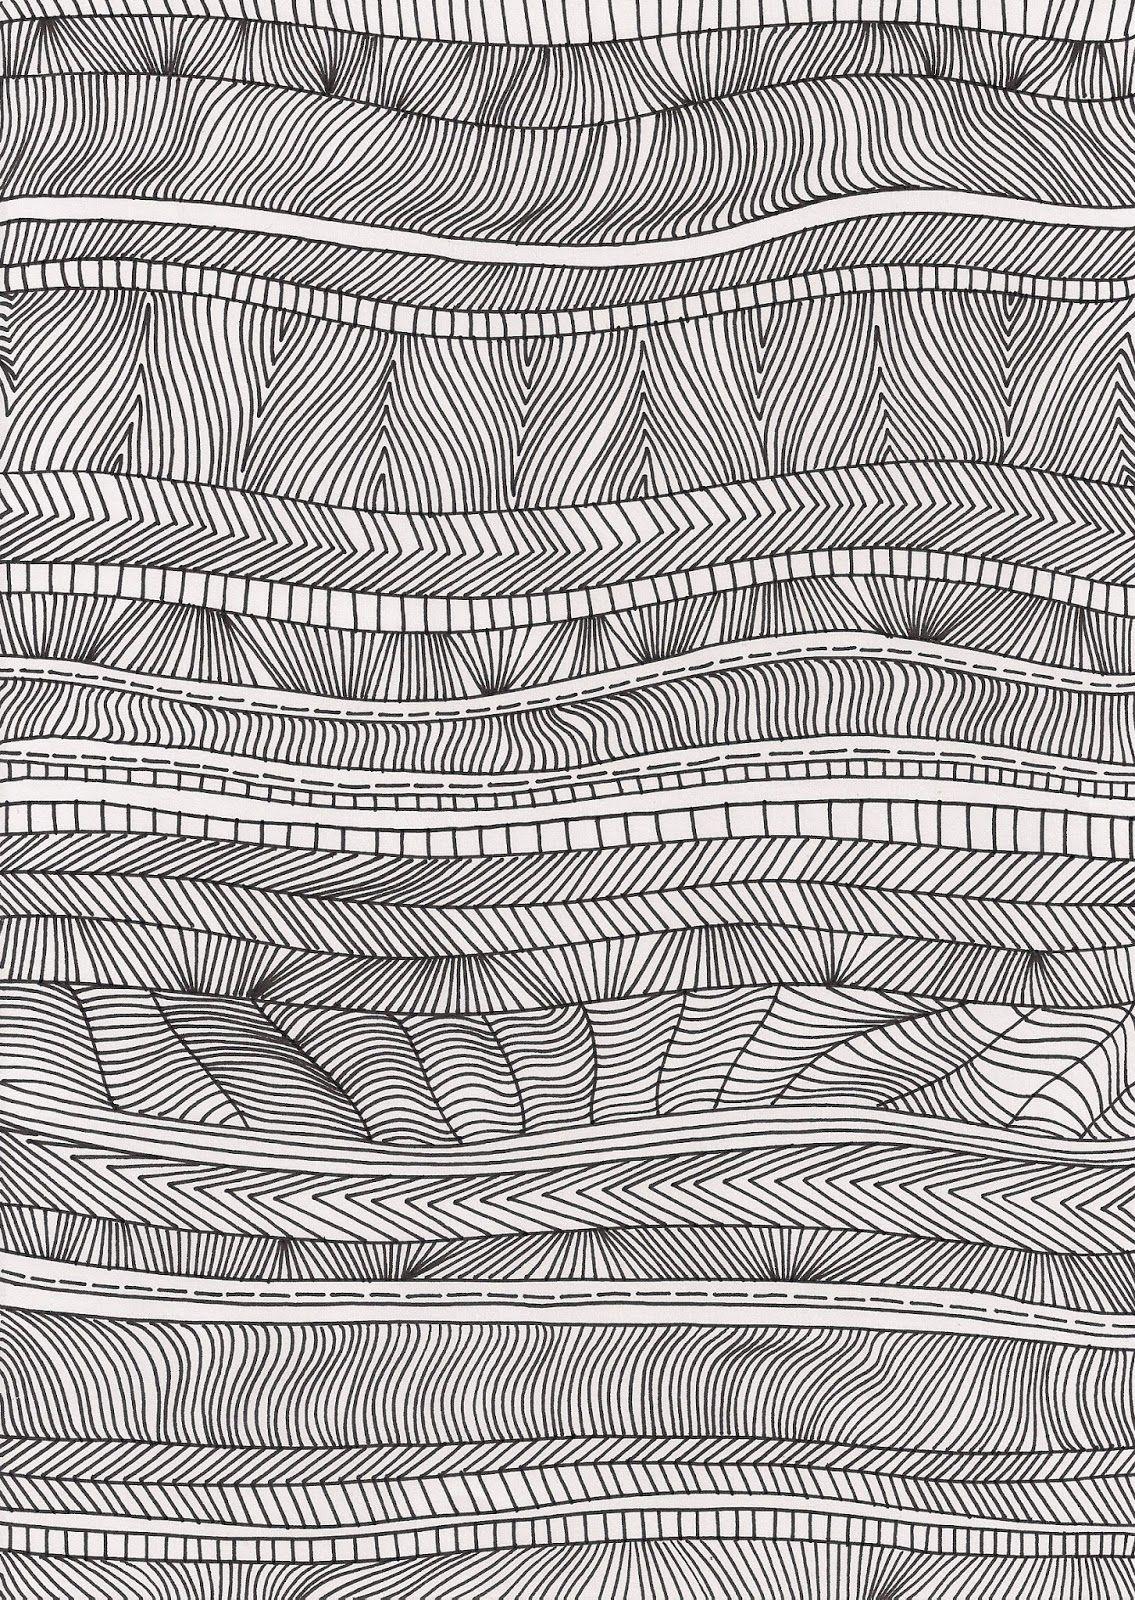 Muster Ethno Linien Dreiecke Ink Illustrations